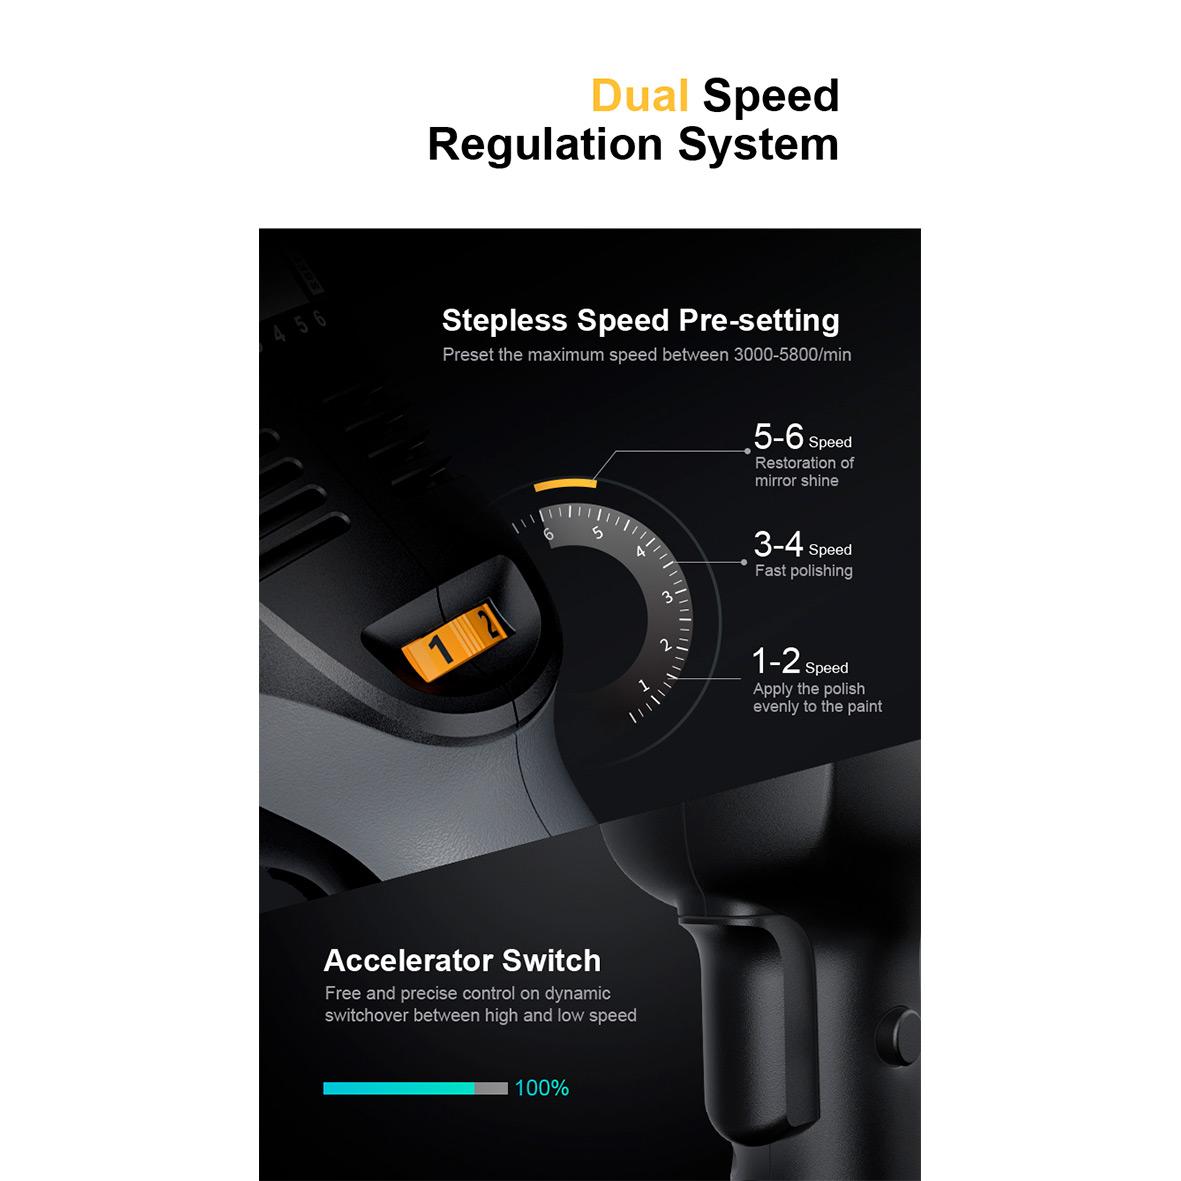 Dual speed regulation system. Shine Mate